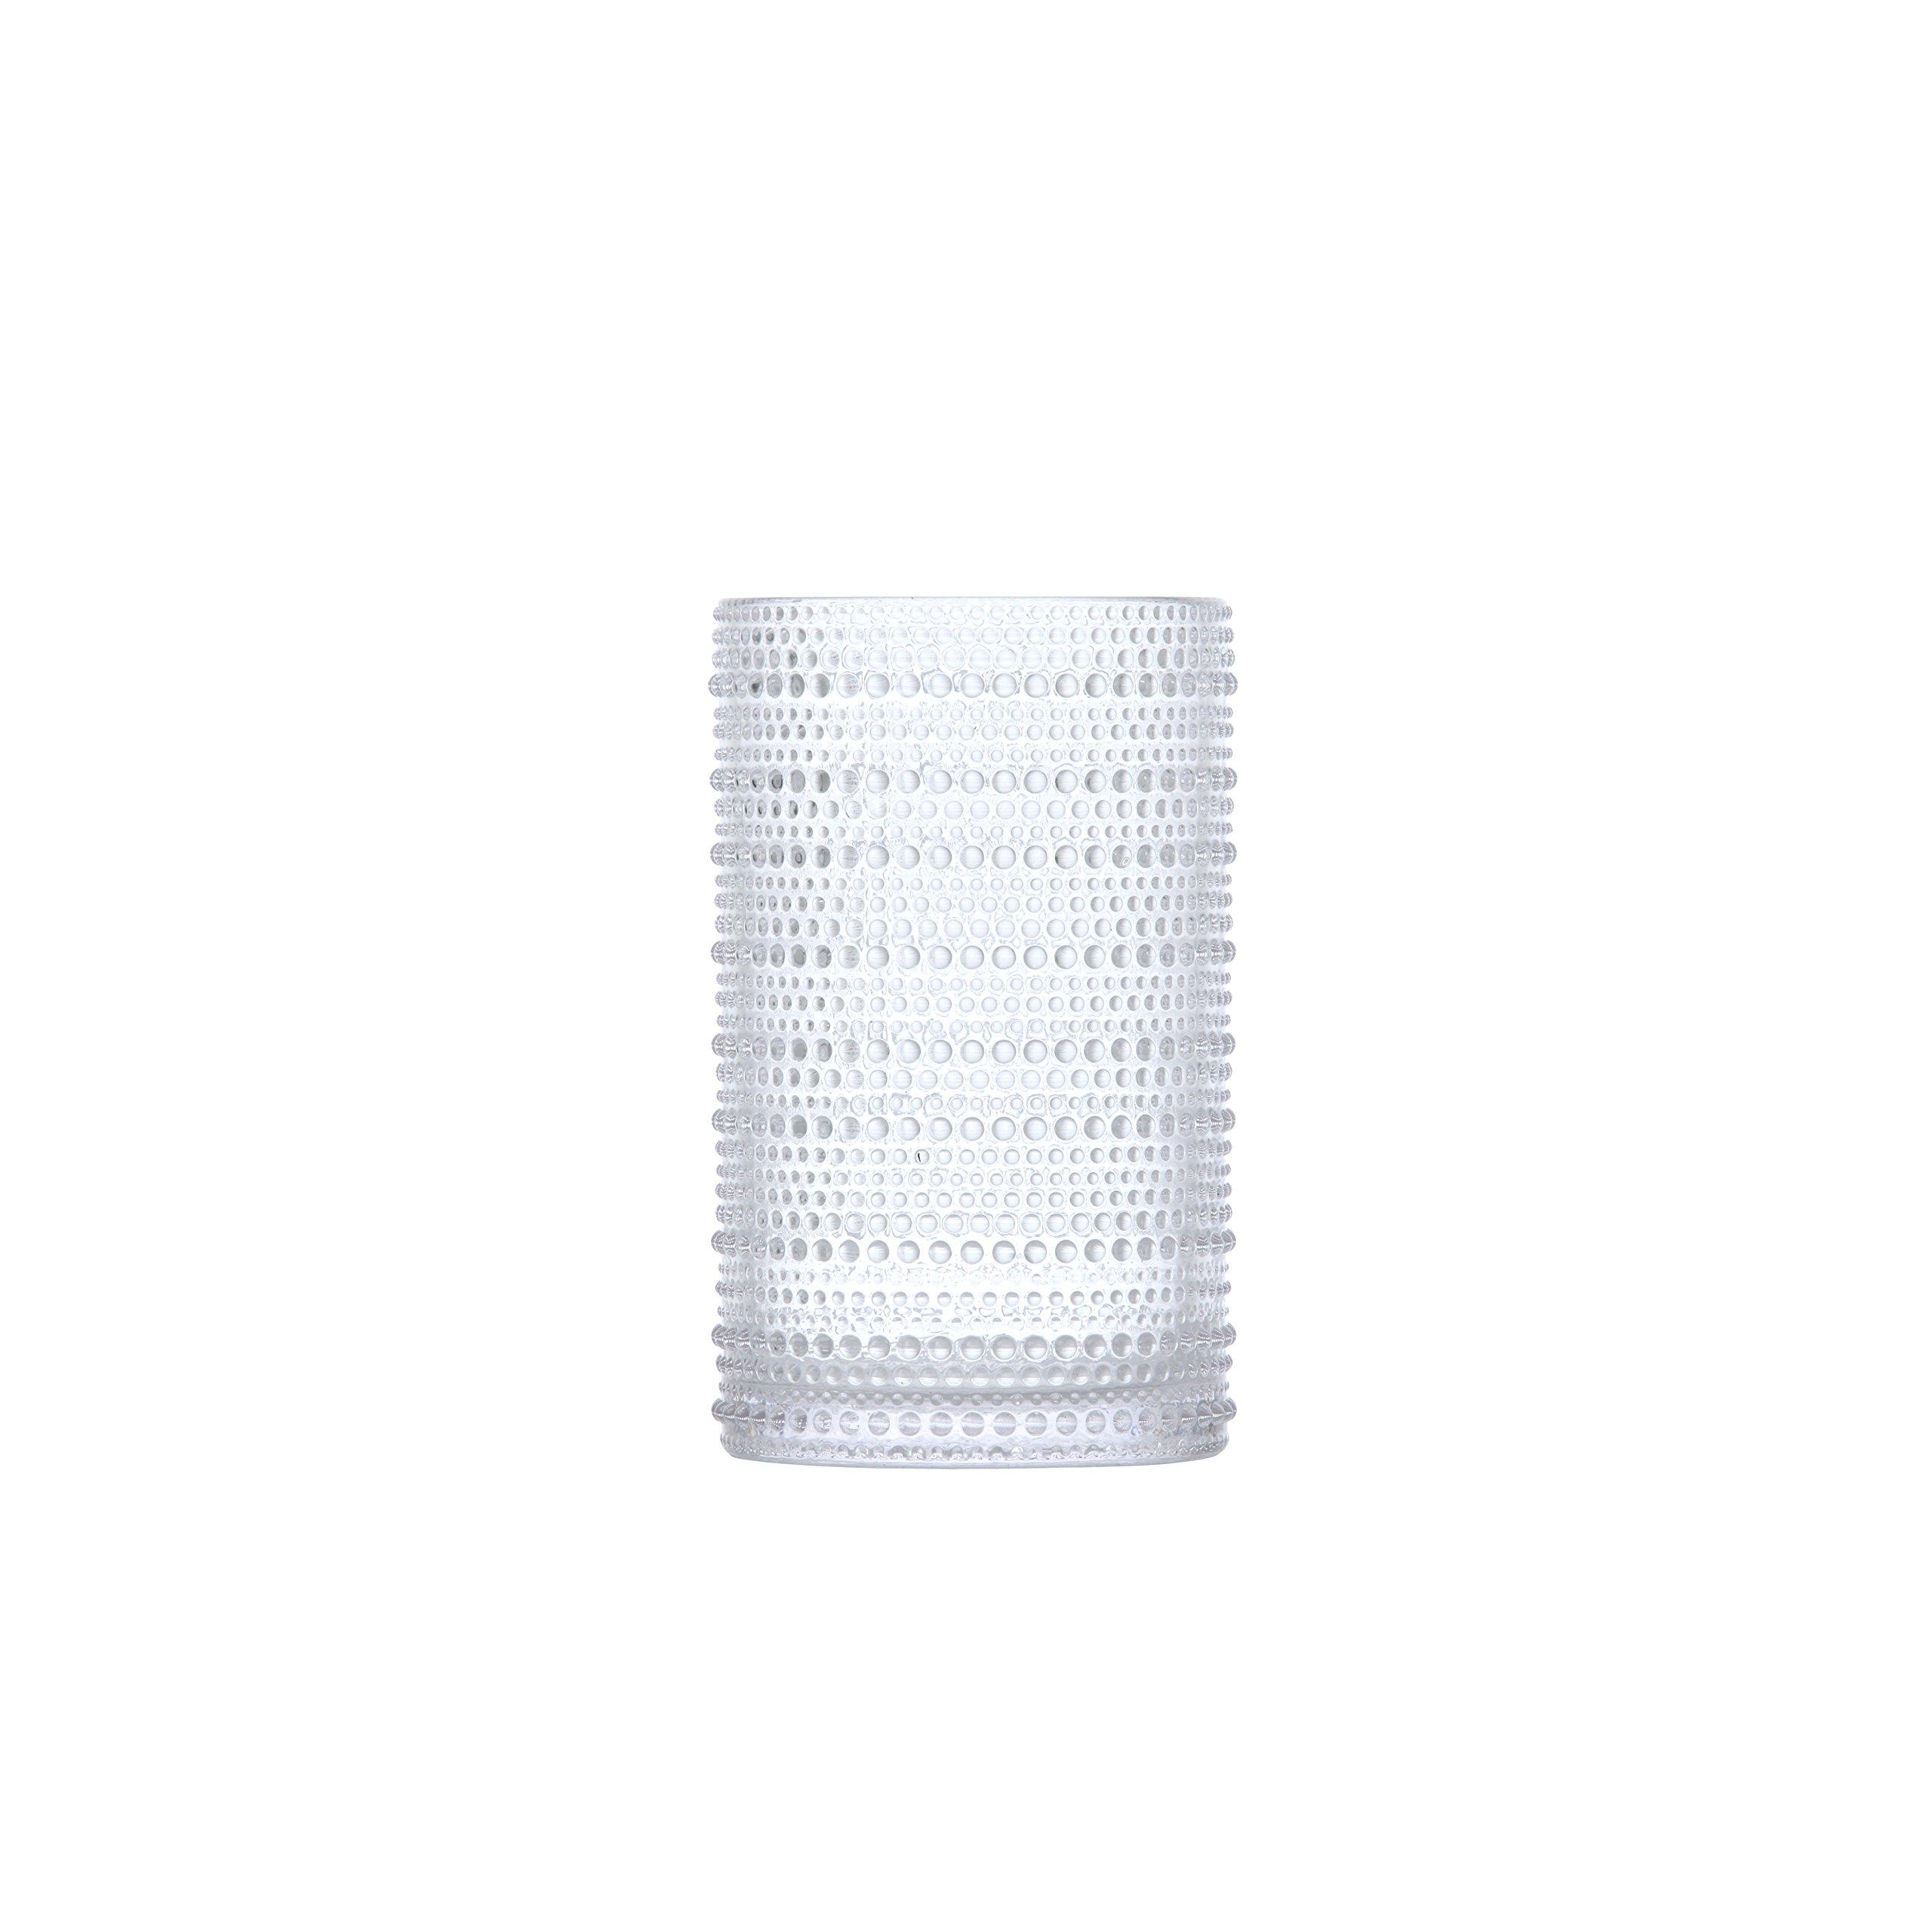 D&V Jupiter Glass Collection Iced Beverage, 13 Ounce, Clear, Set of 6